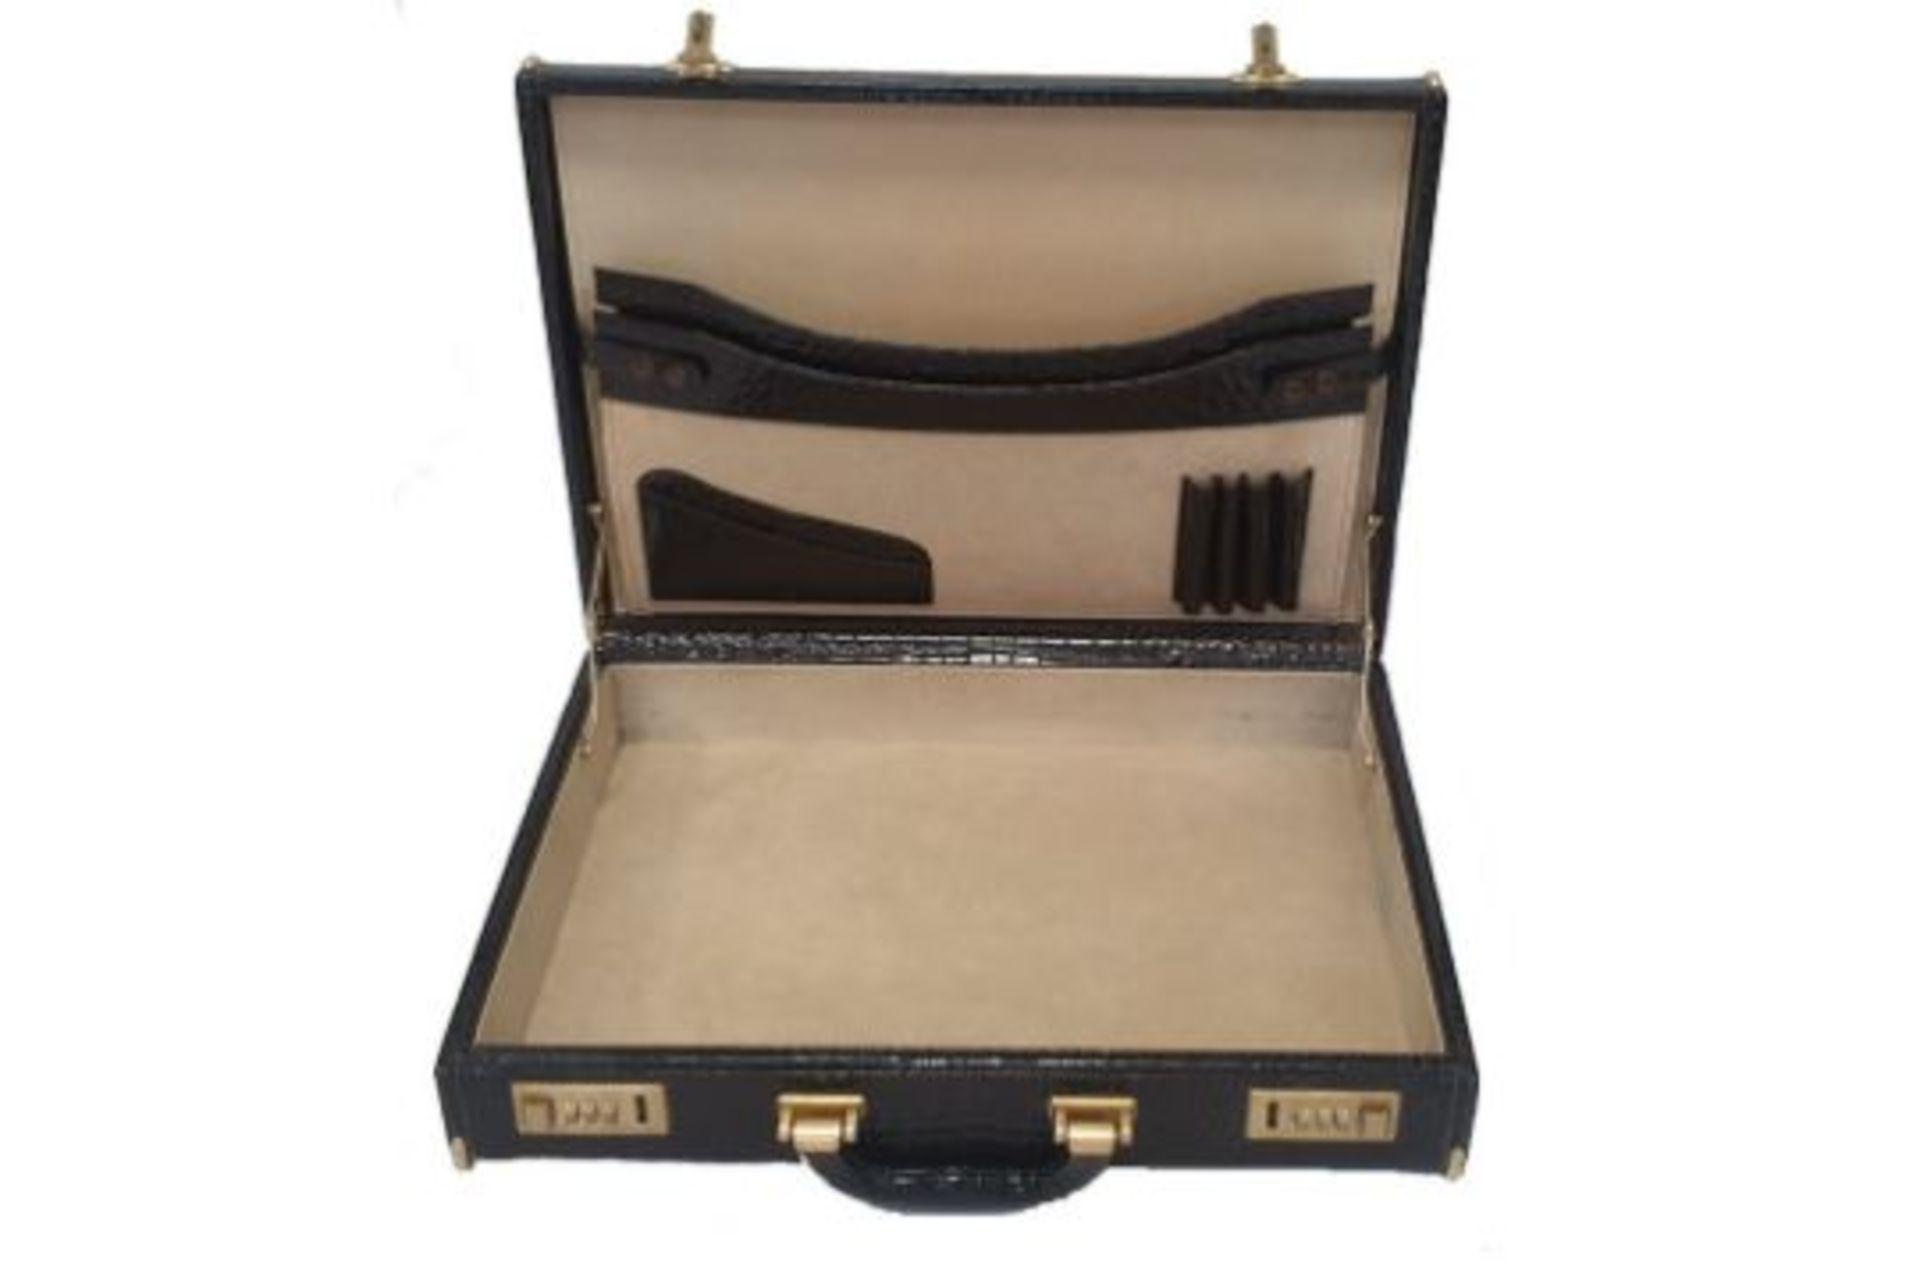 Crocodile Leather   Briefcase - Image 2 of 5